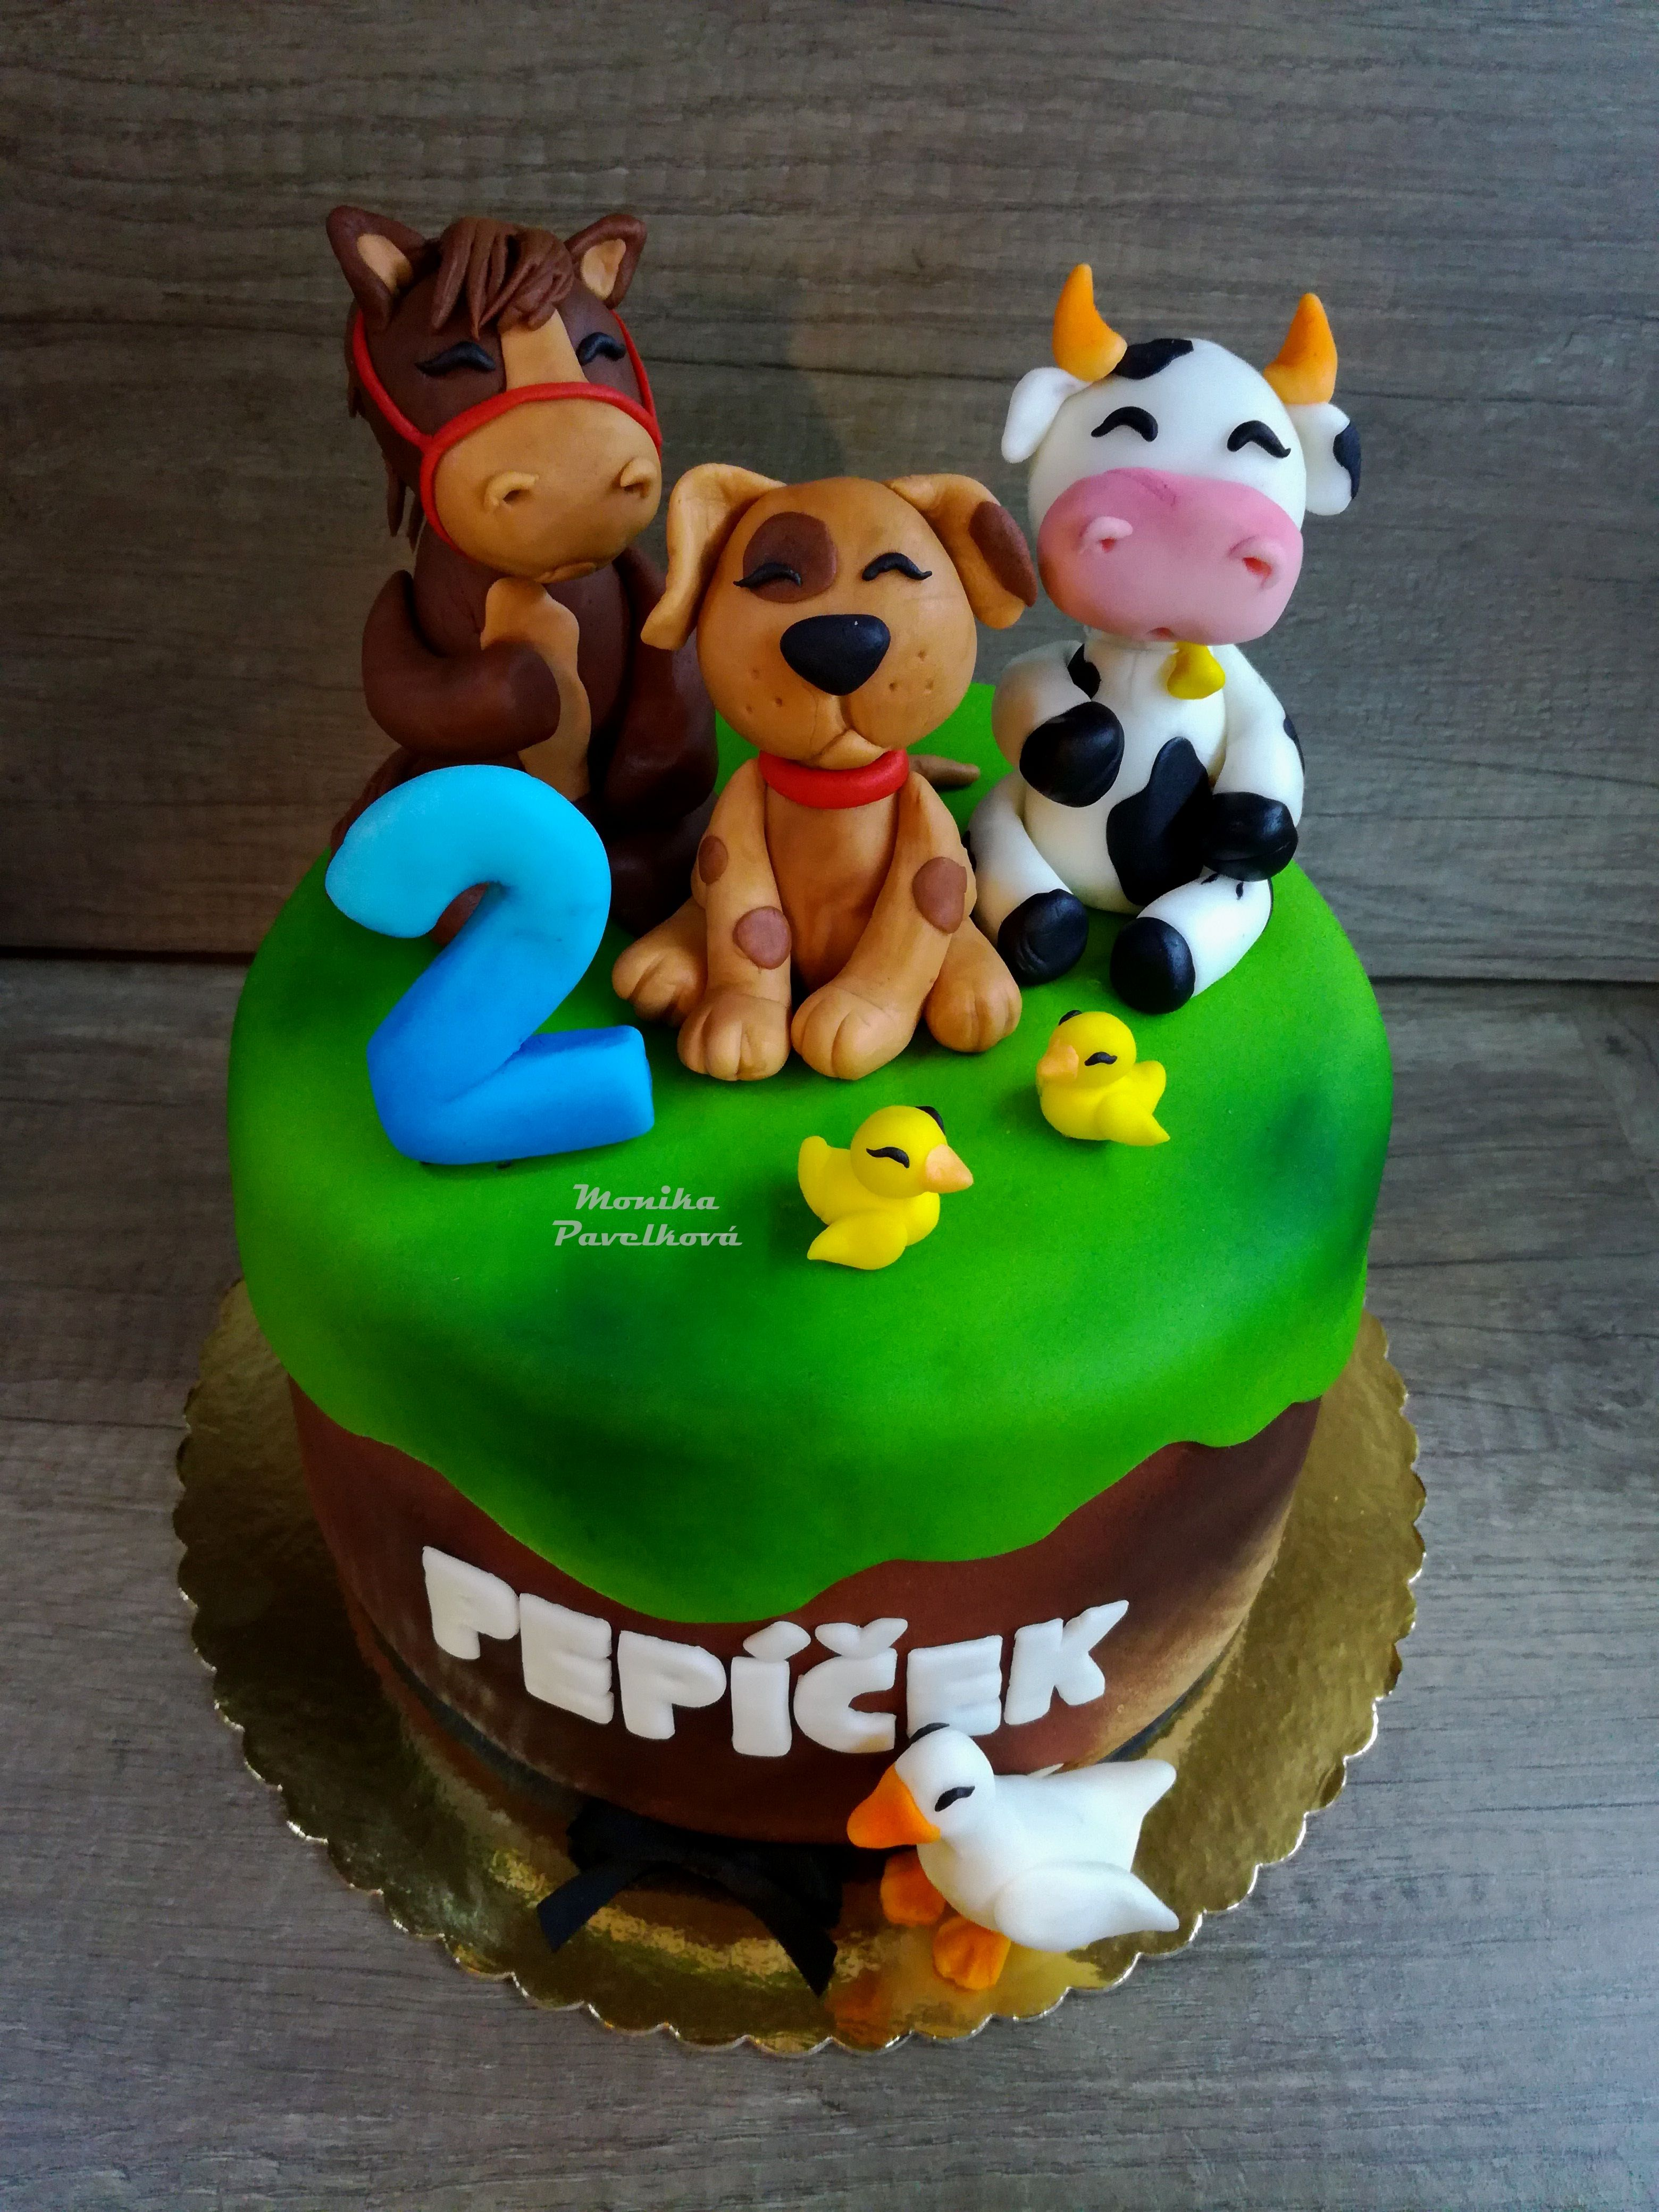 Farm animals CAKE. DORT zvířátka z farmy. Farm animal